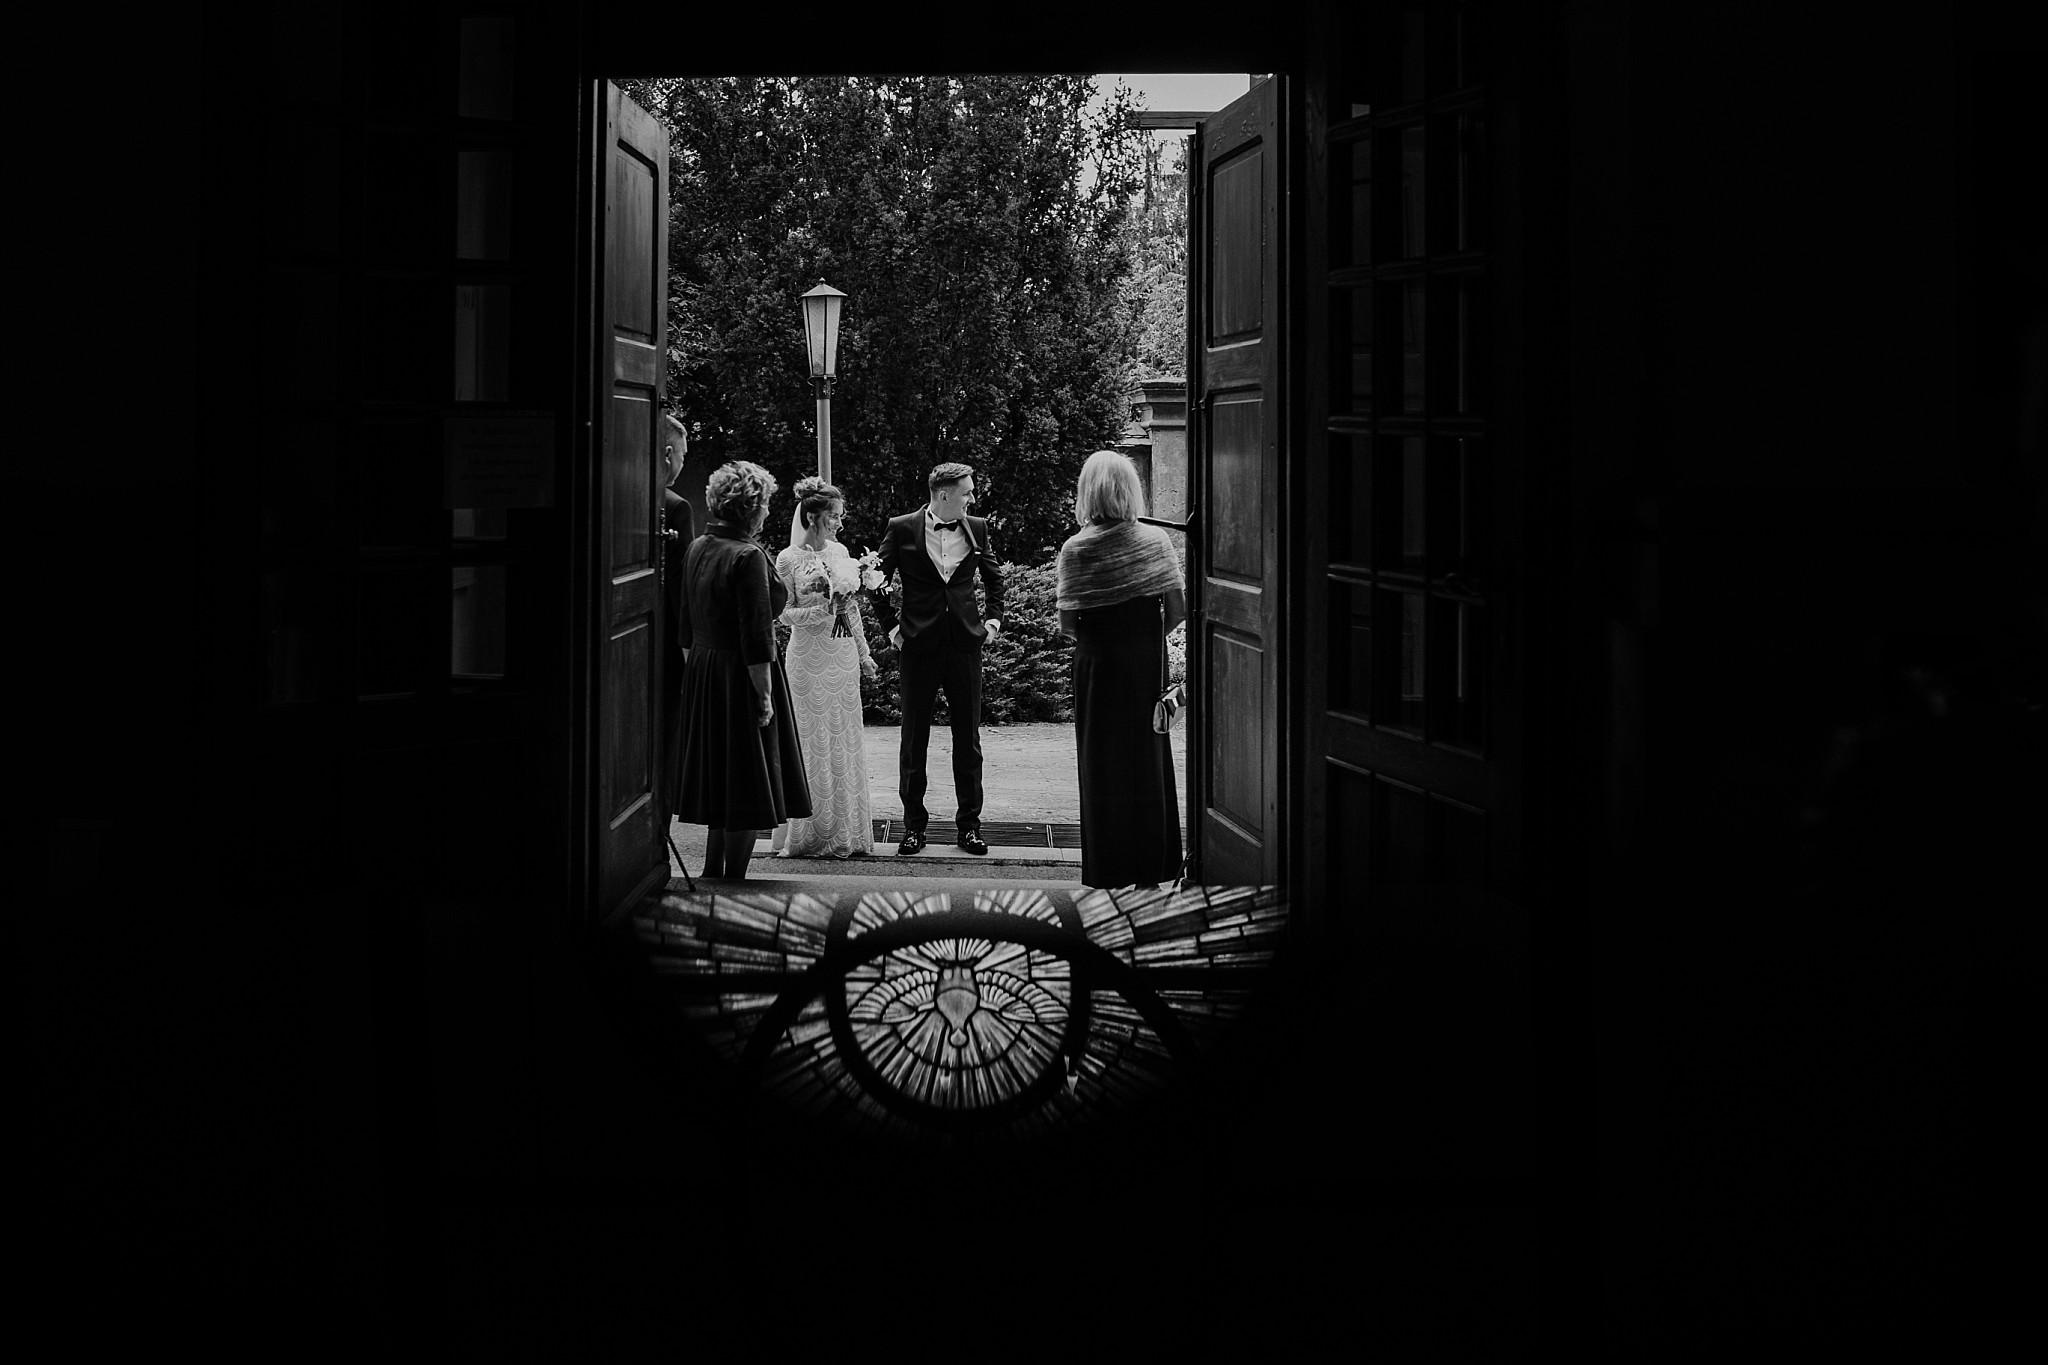 fotograf poznan wesele dobra truskawka piekne wesele pod poznaniem wesele w dobrej truskawce piekna para mloda slub marzen slub koronawirus slub listopad wesele koronawirus 139